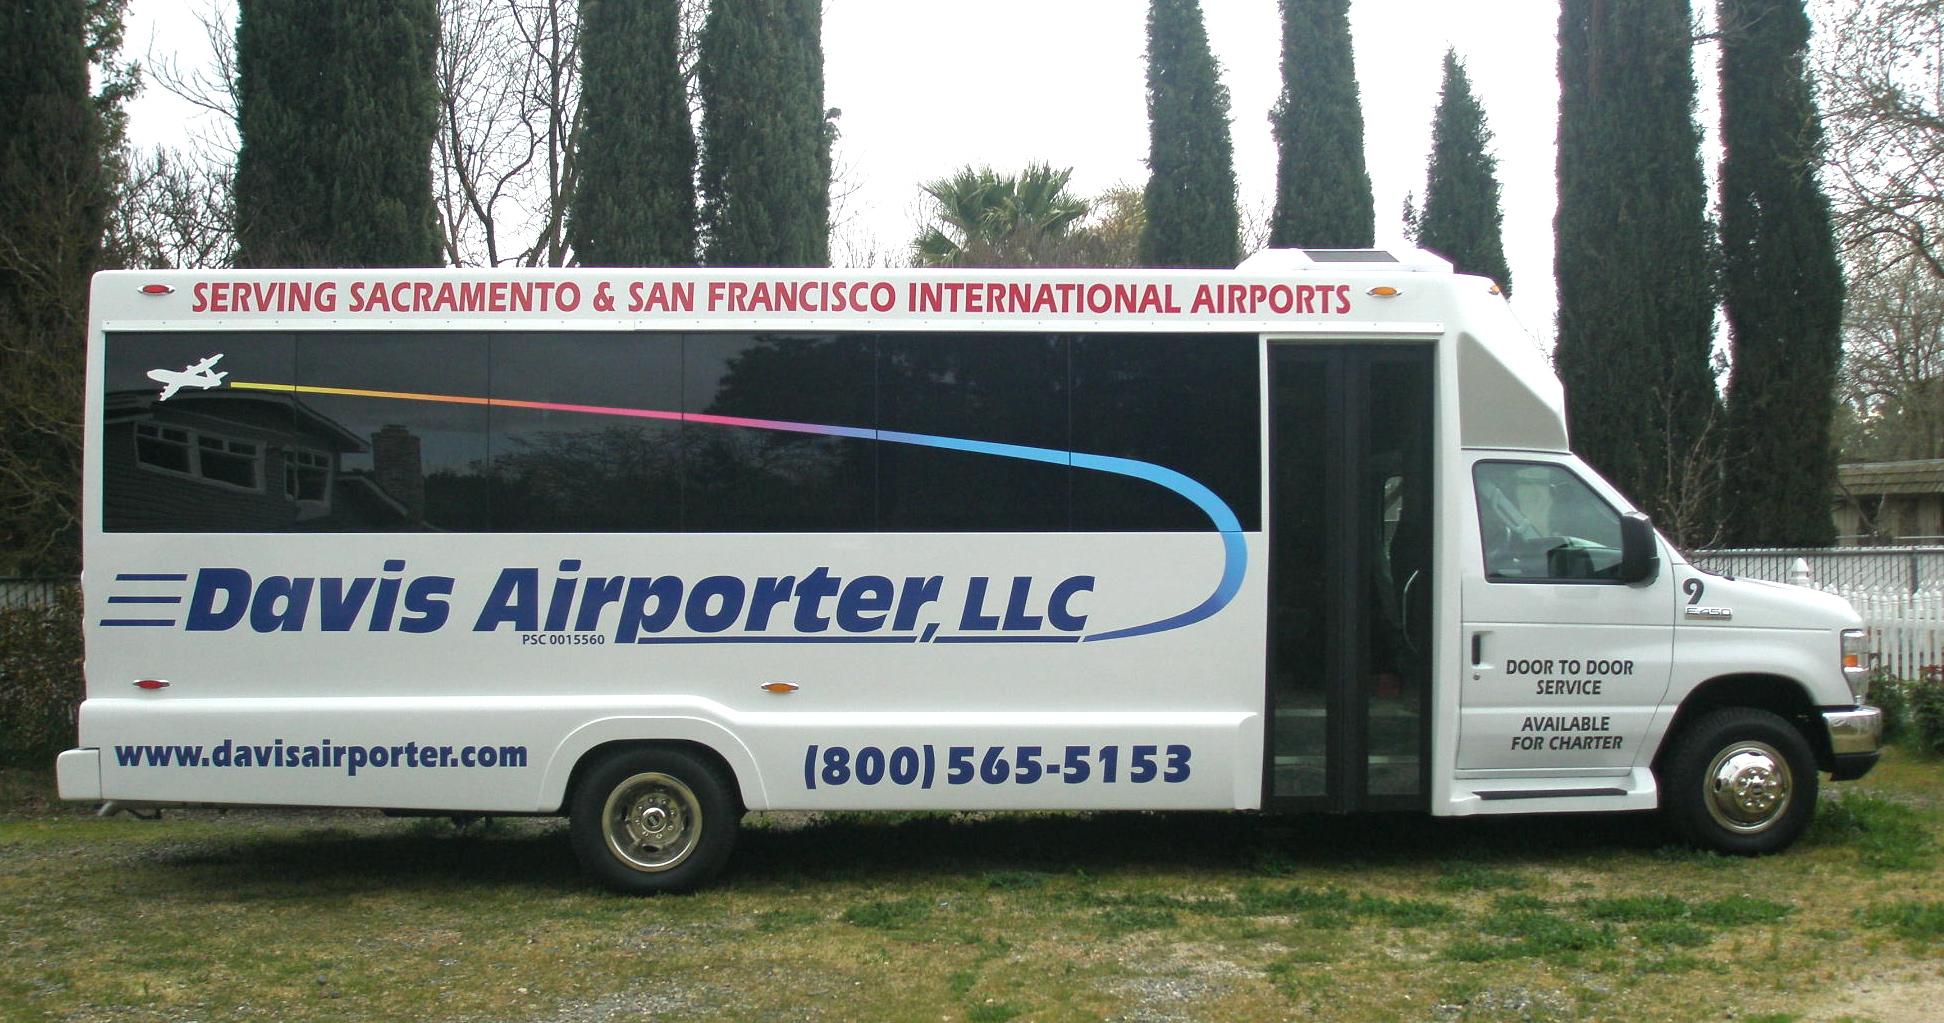 Airporter Big Bus.JPG